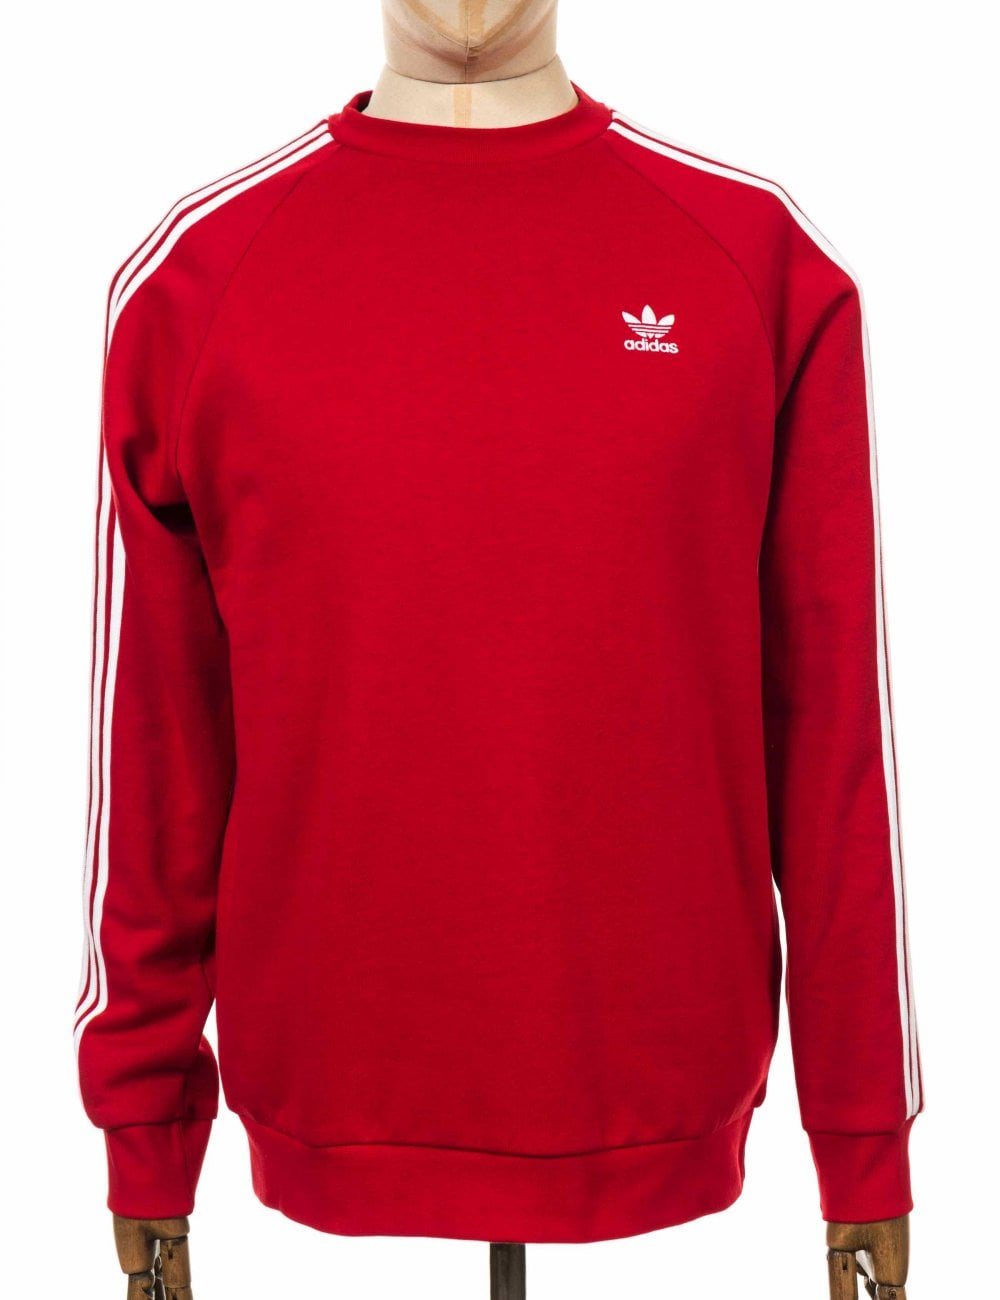 Adidas Originals 3 Stripe Trefoil Sweatshirt - Power Red - Clothing ... 6edfc318760a